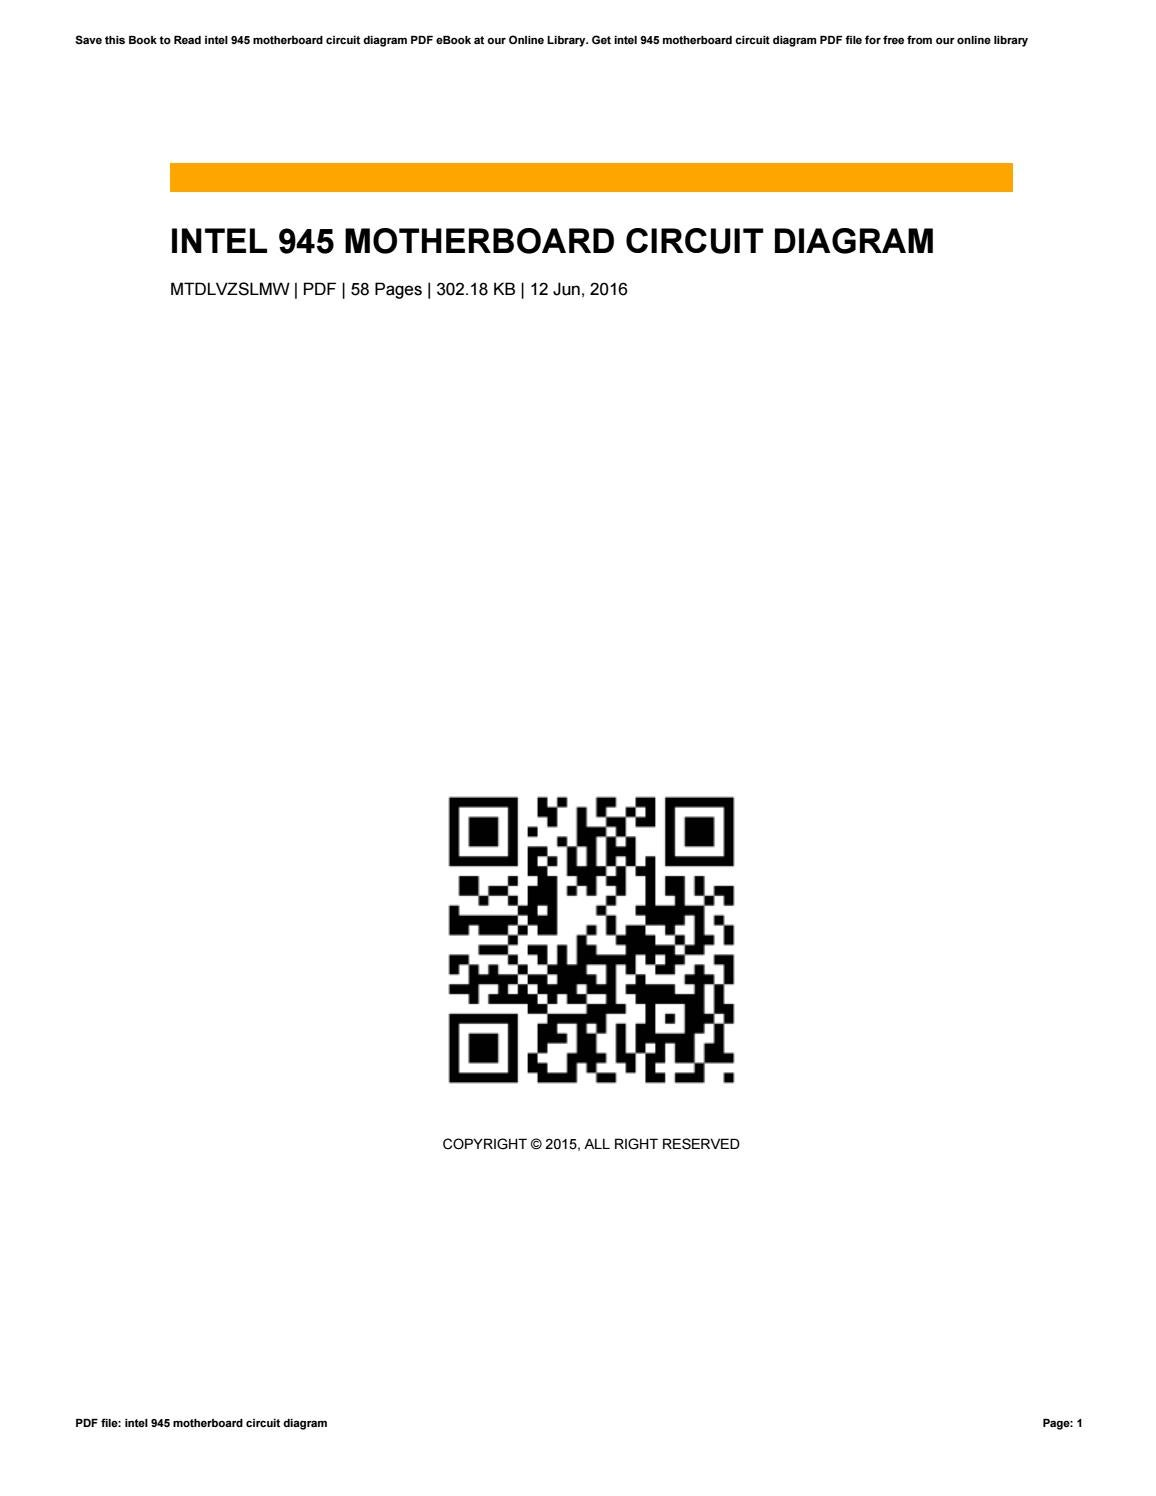 intel motherboard circuit diagram pdf 2010 ford ranger turn signal wiring 945 by wendyortiz3530 issuu